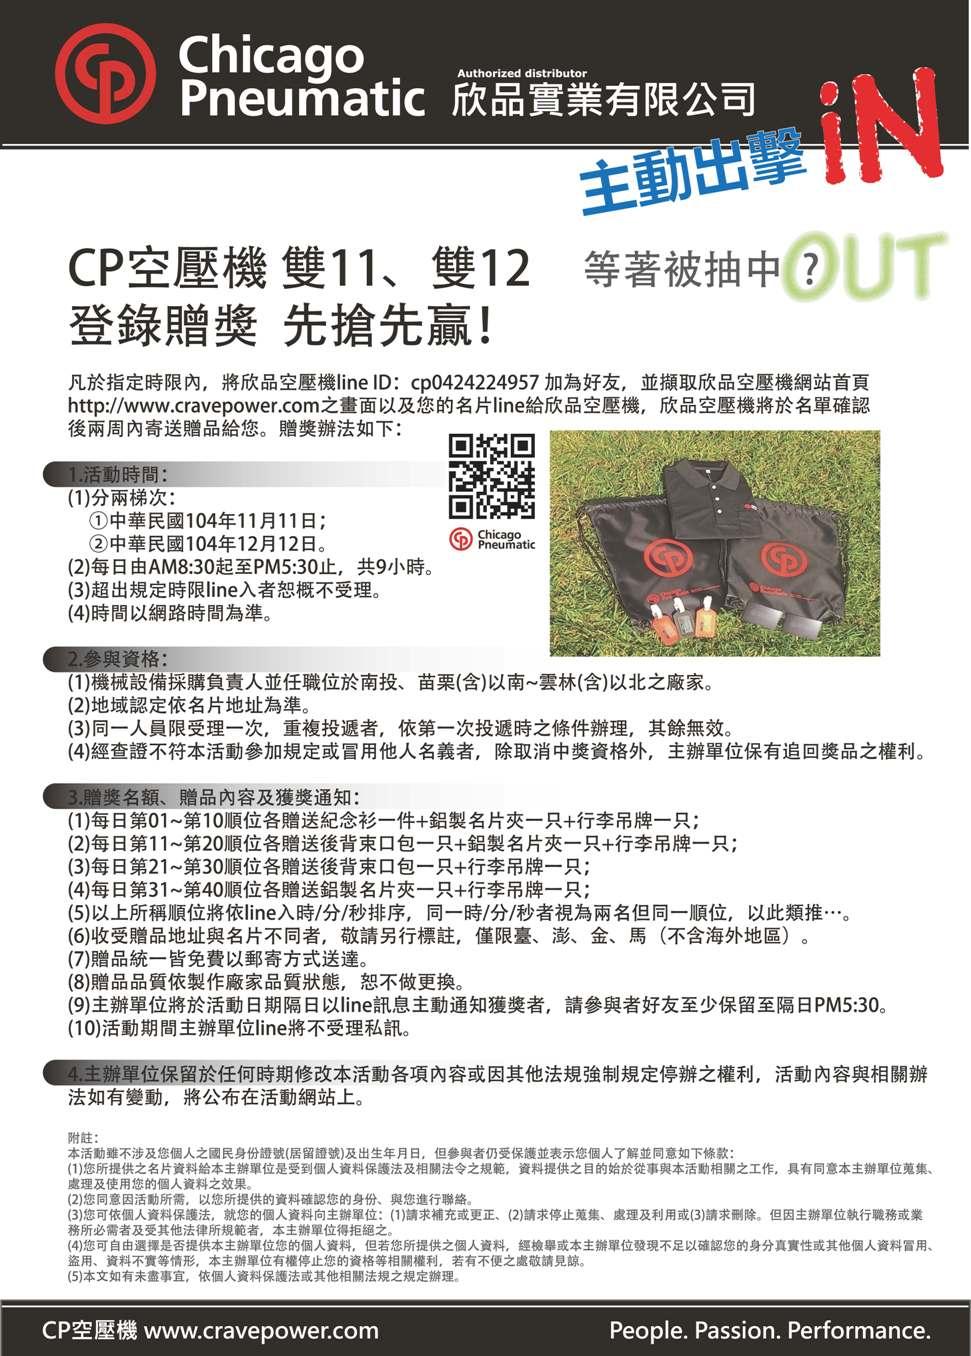 CP空壓機贈獎活動簡章